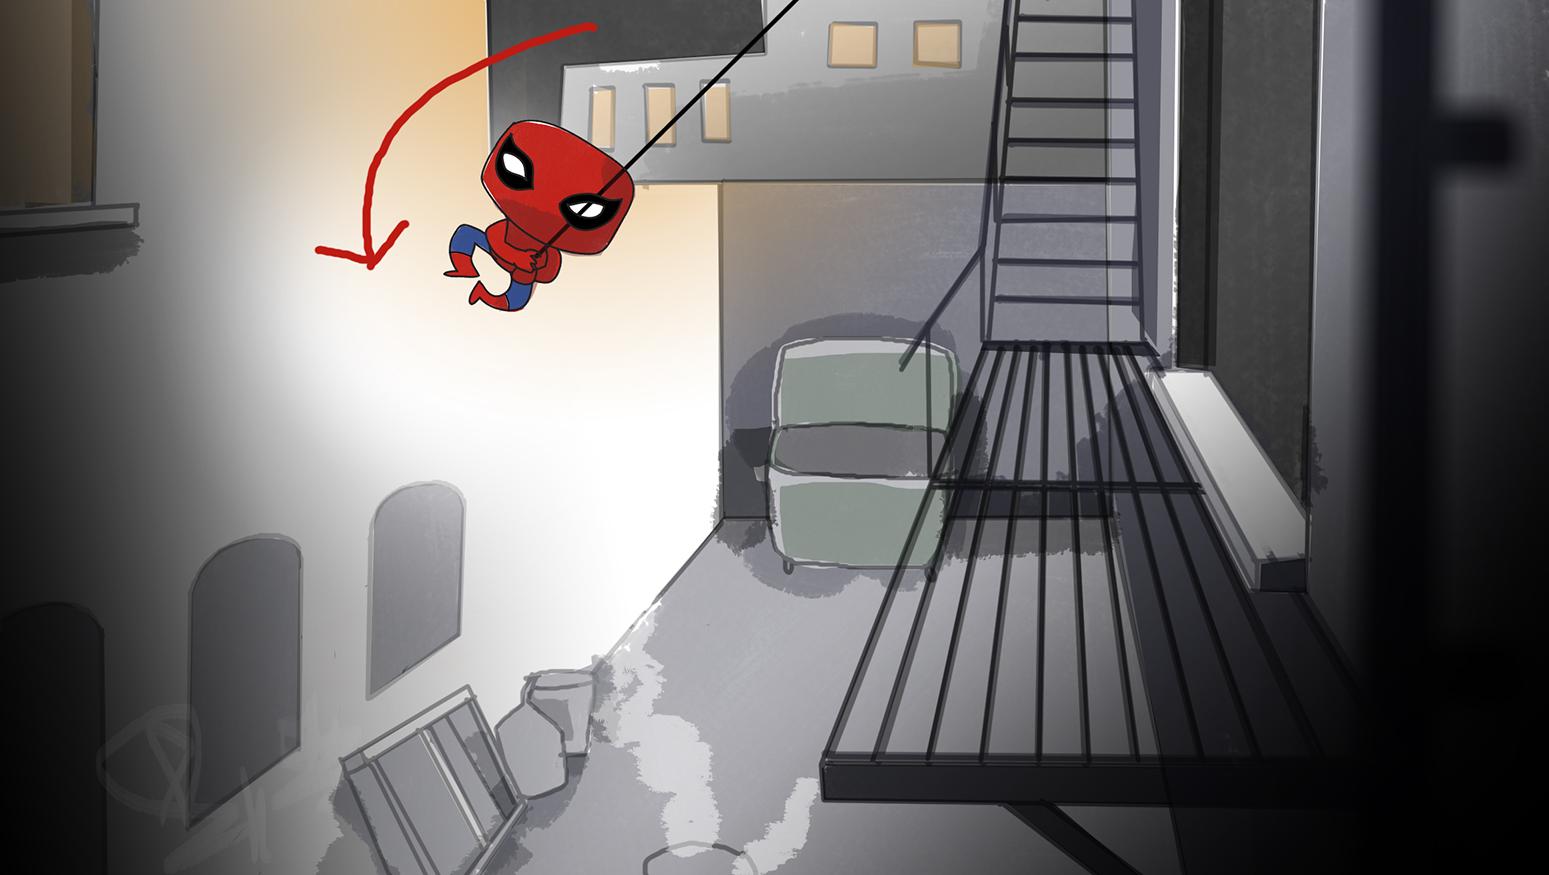 Spiderman_Vulture_01V05 copy.jpg